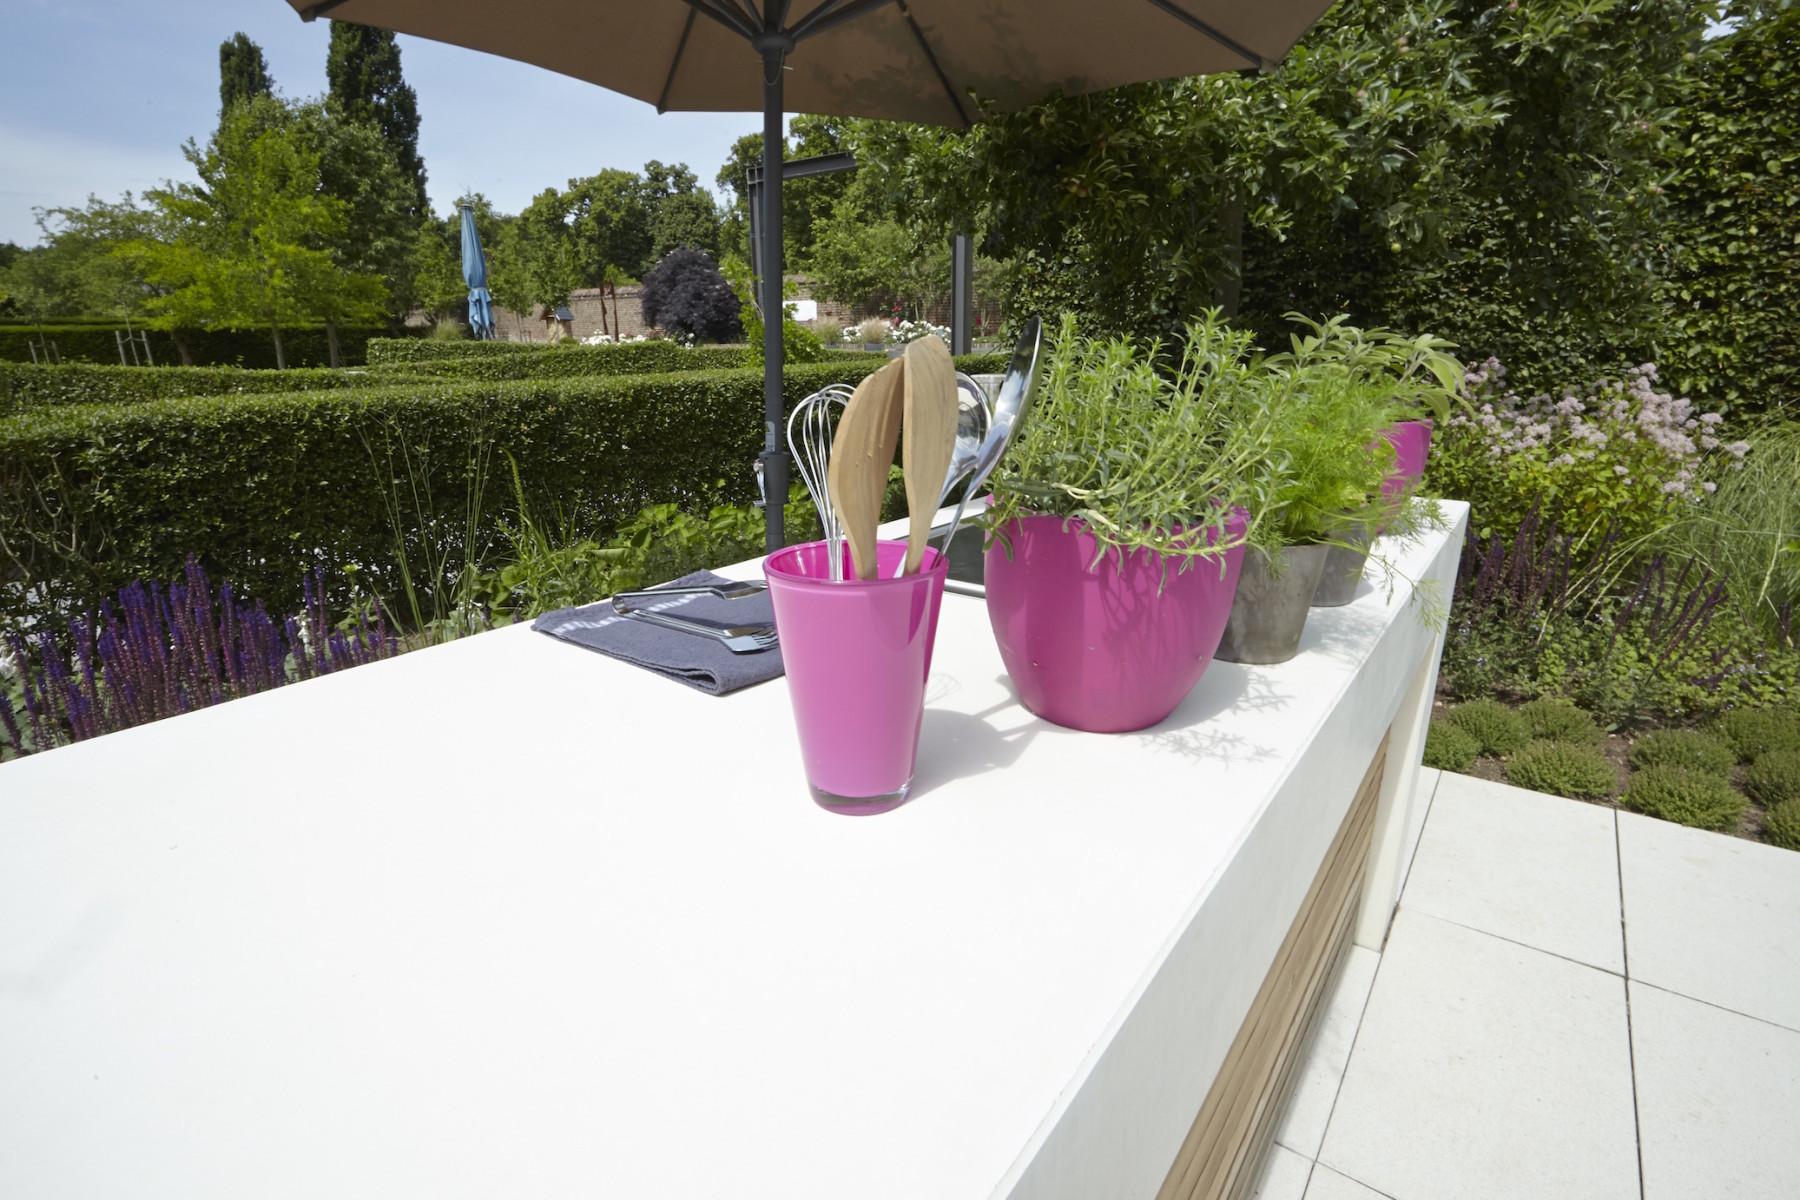 Sommerküchen Garten : Callwey gartenstory küchengarten kochen im garten gdj